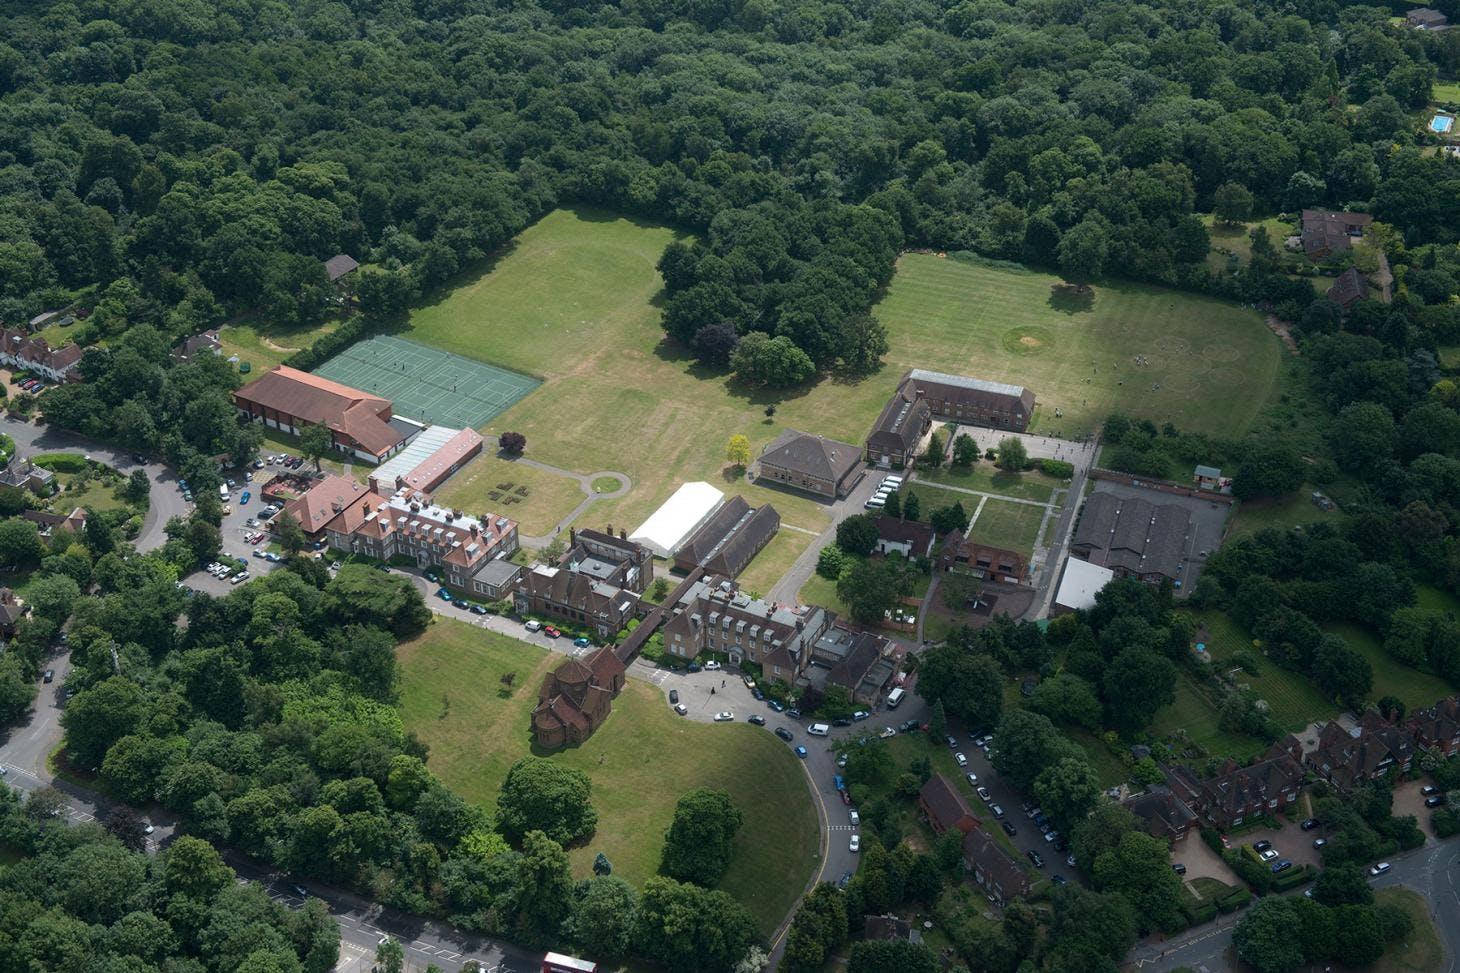 Farringtons School 11 a side | Astroturf football pitch